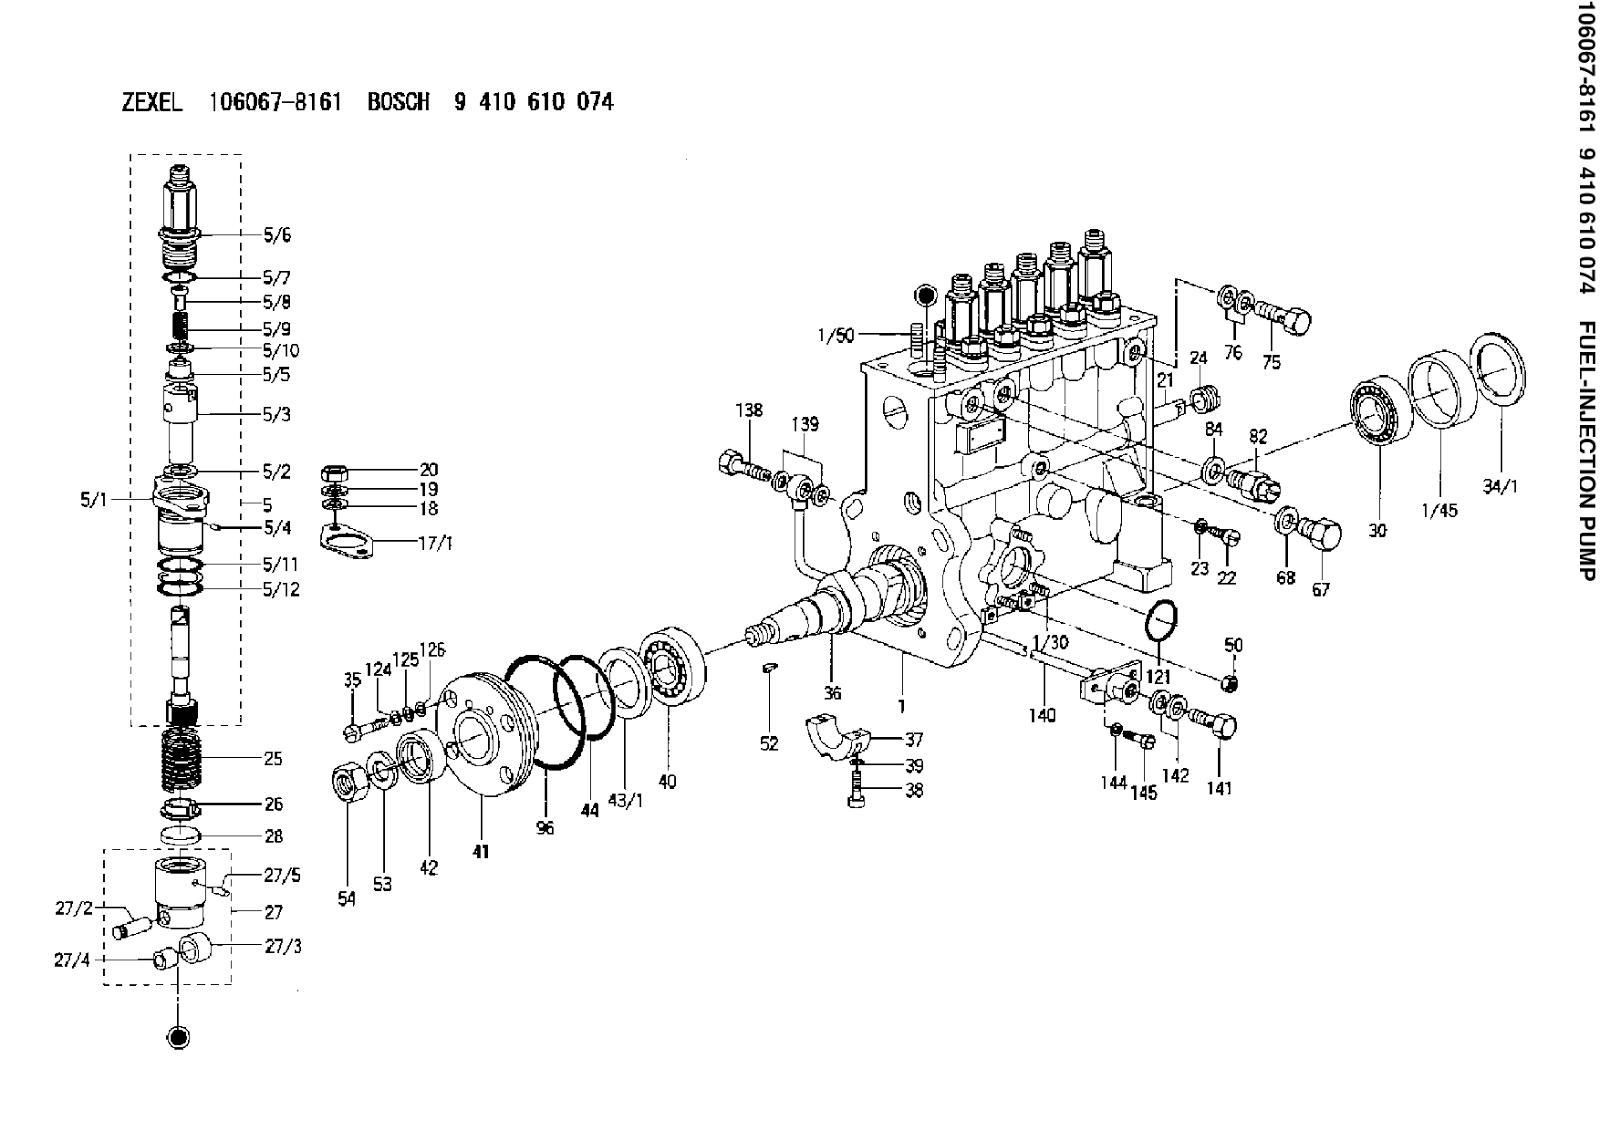 medium resolution of 9410610074 106067 8161 injection pump zexel bosch